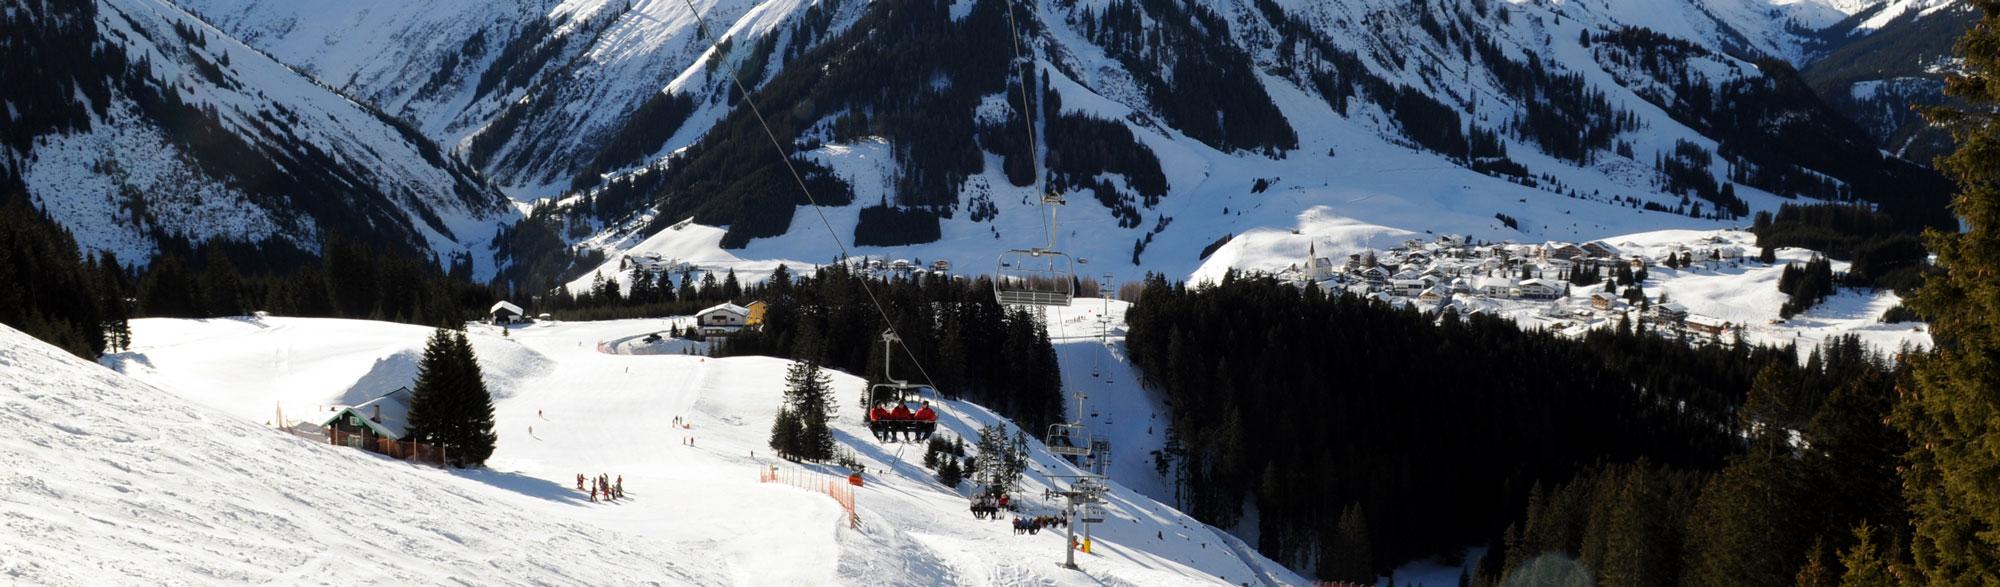 skiën_Berwang_Cornelia_piste_snowboarden_langlaufen,skiën_Berwang_Cornelia_arena_snowboarden_langlaufen,skiing_Berwang_Cornelia_arena_snowboarden_crosscountryskiing